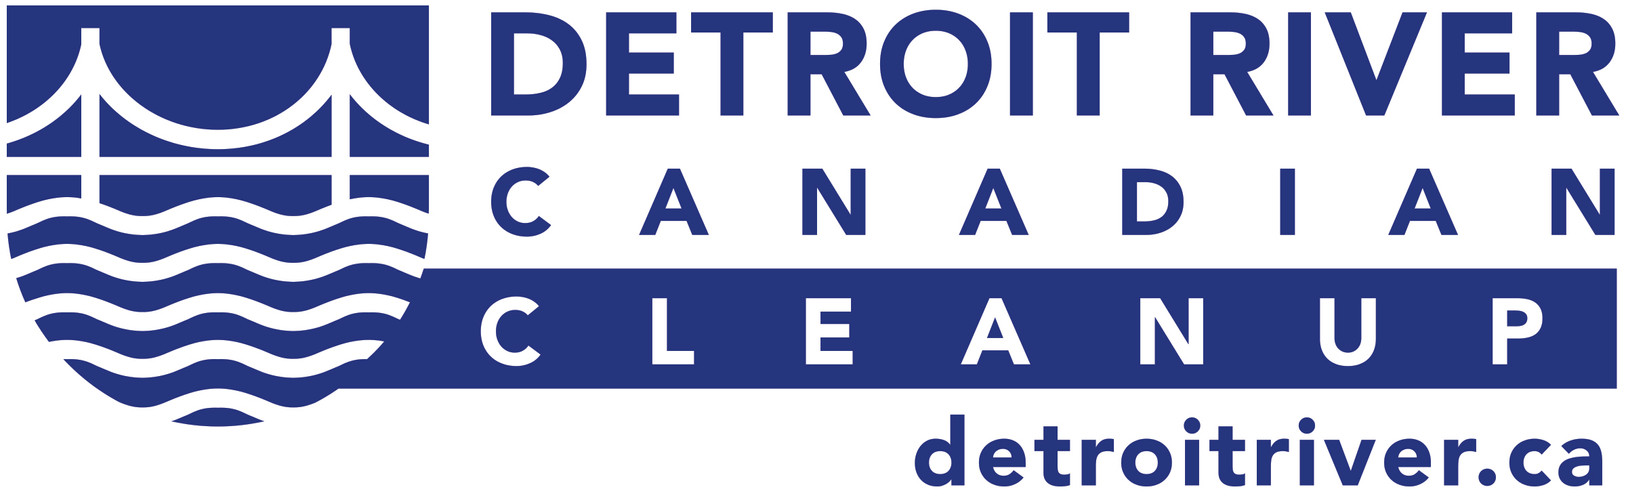 Detroit River Canadian Cleanup.jpg